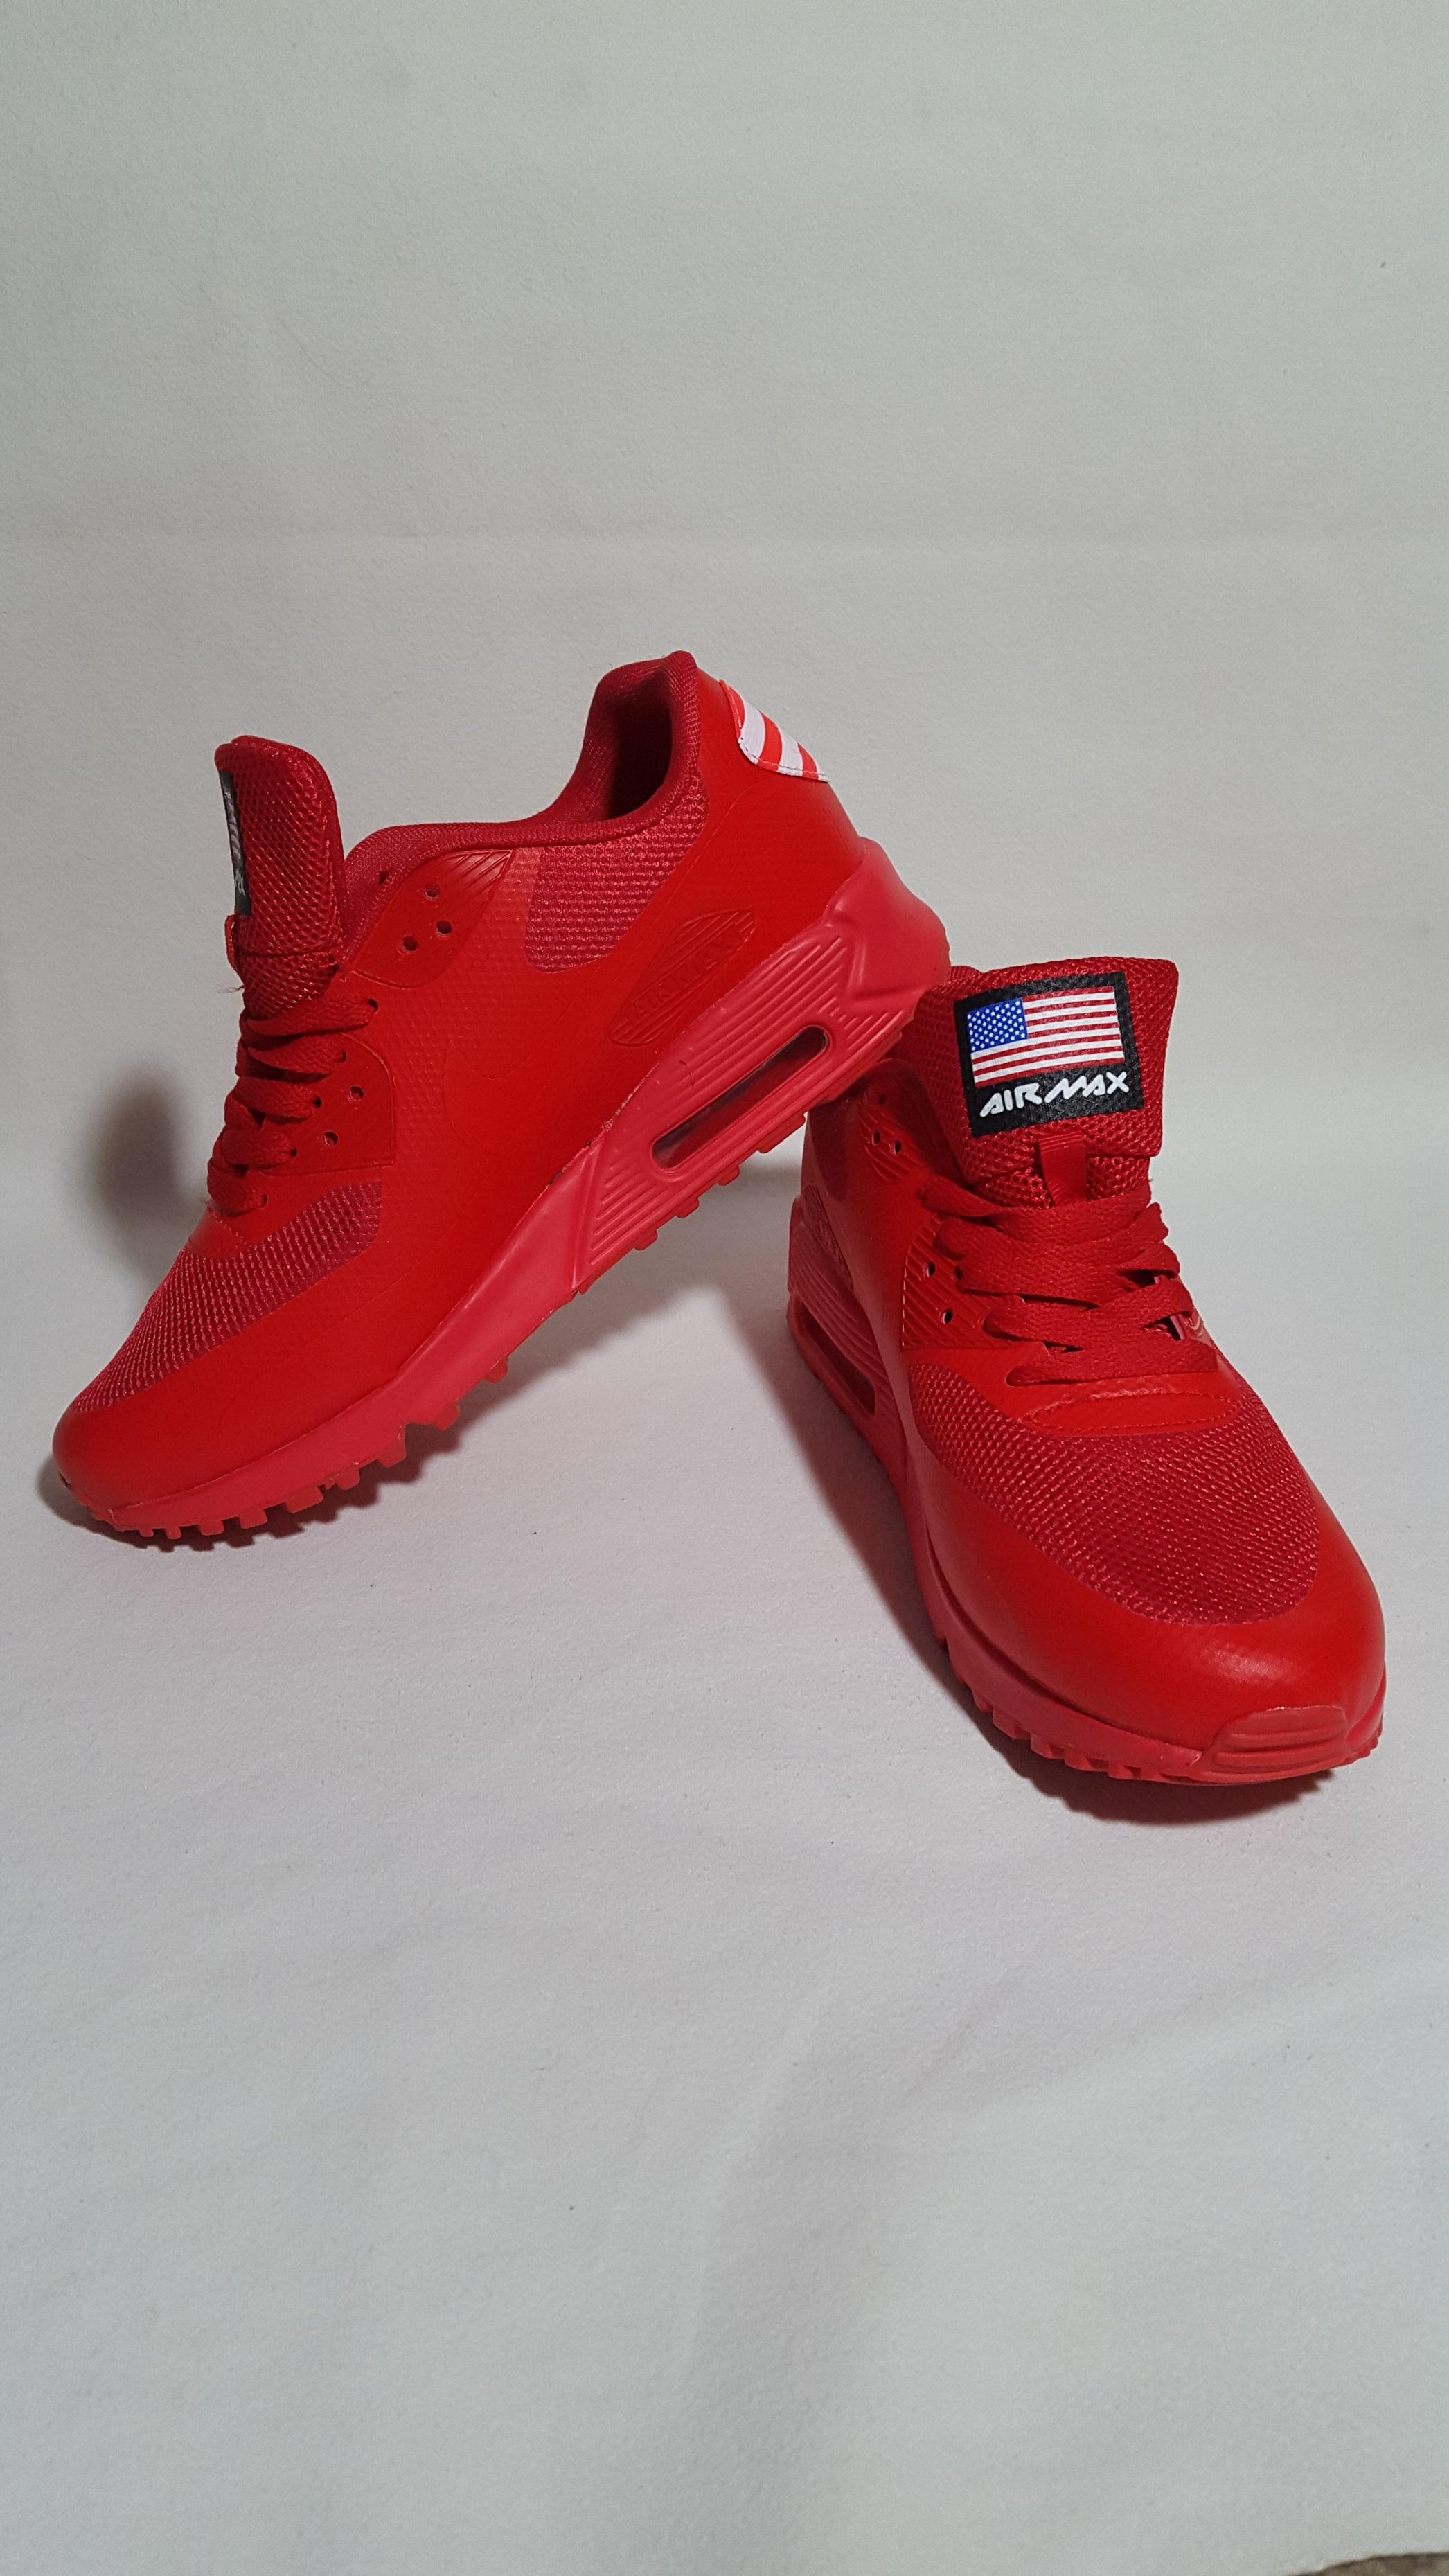 Max Fake Air Nike OriginalSchuhe oder xtdQsrhC